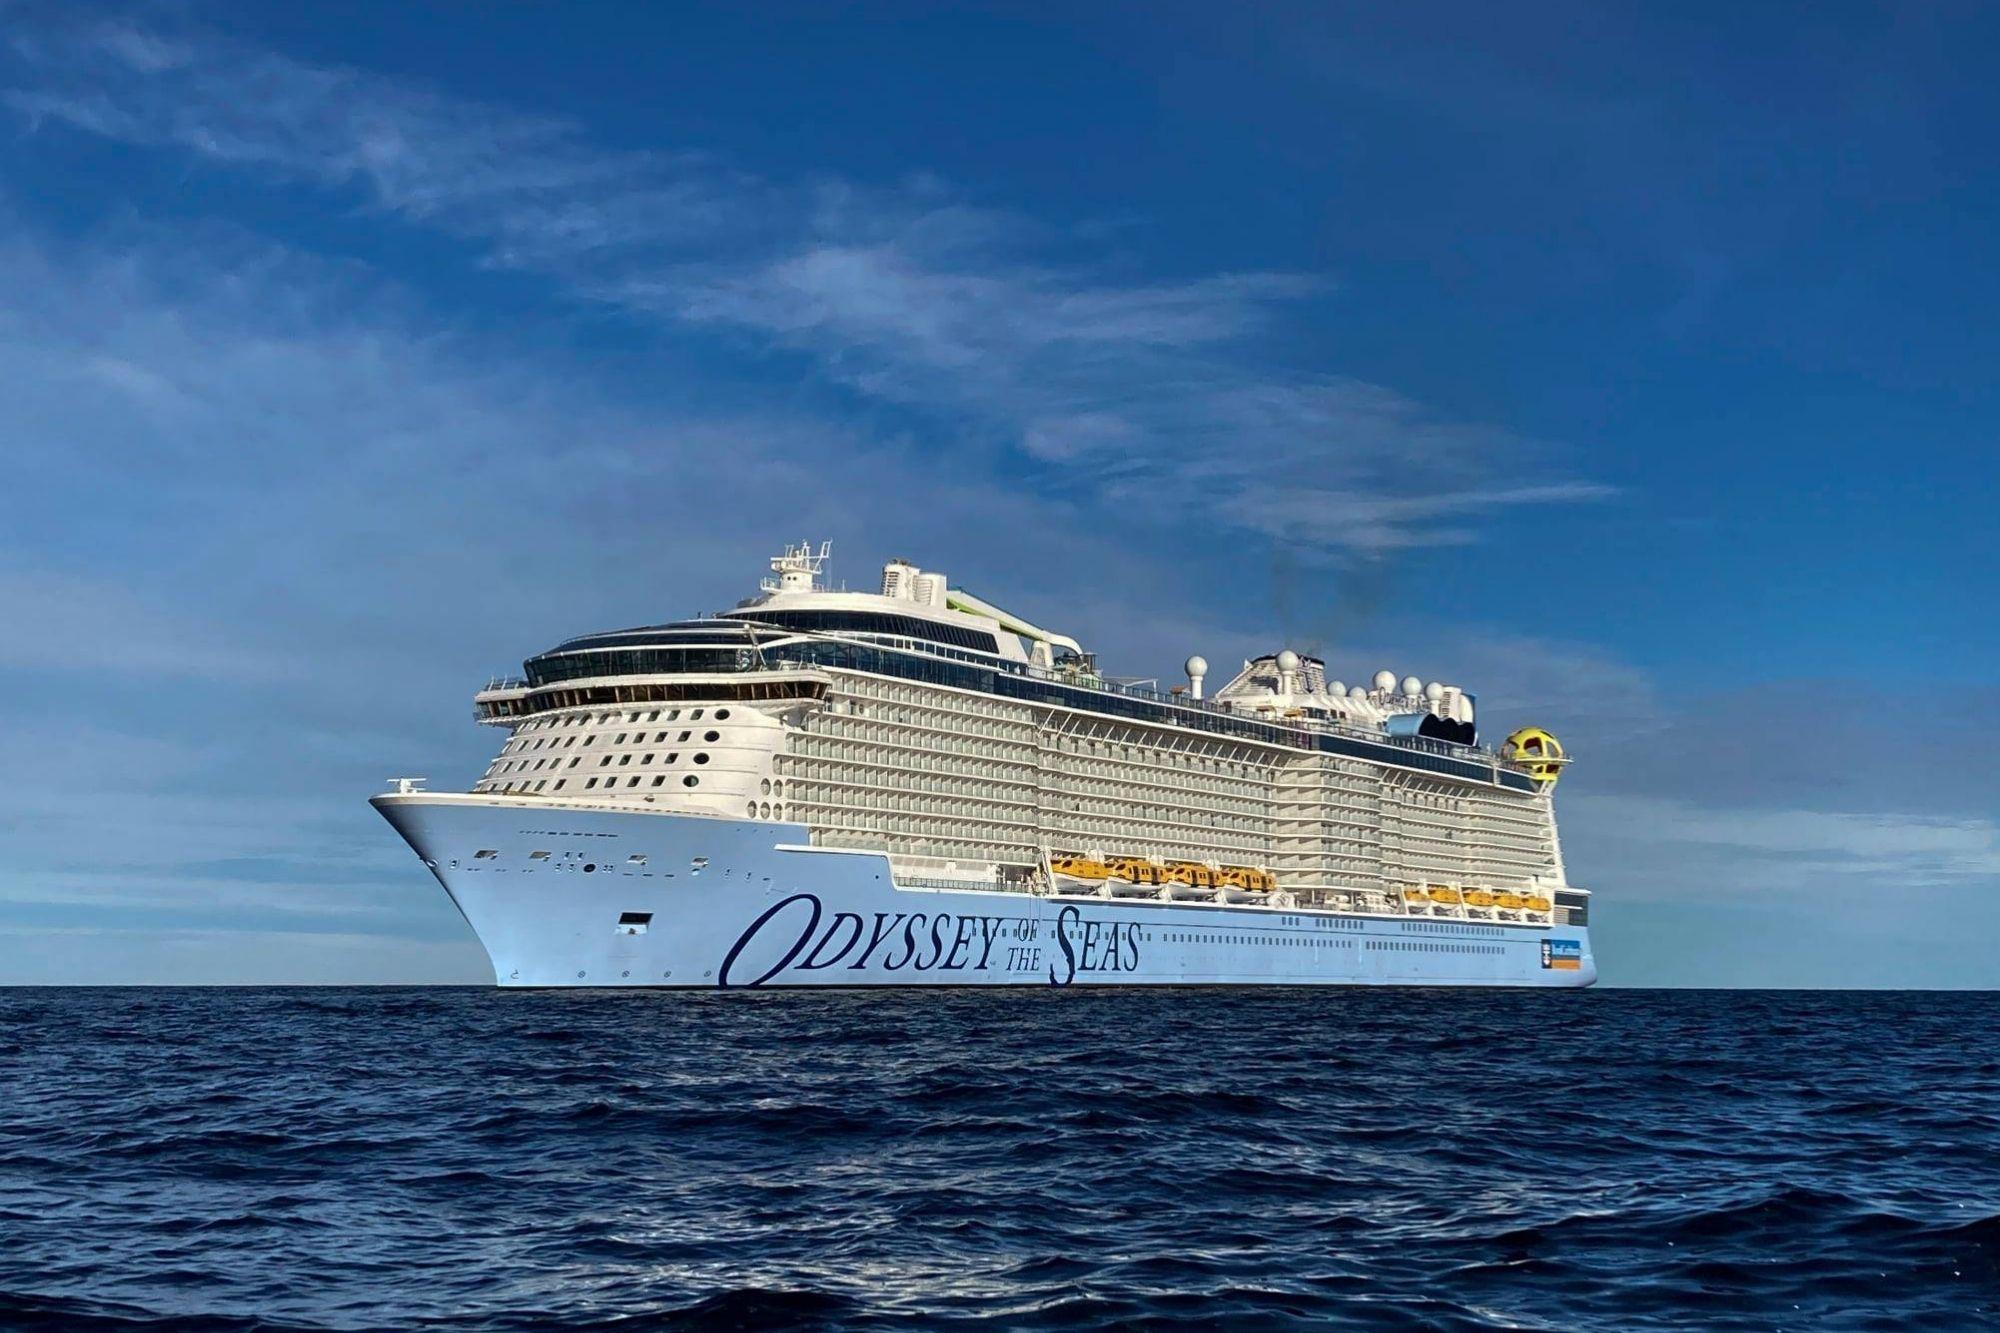 Meyer Werft übergibt Odyssey of the Seas an Royal Caribbean International